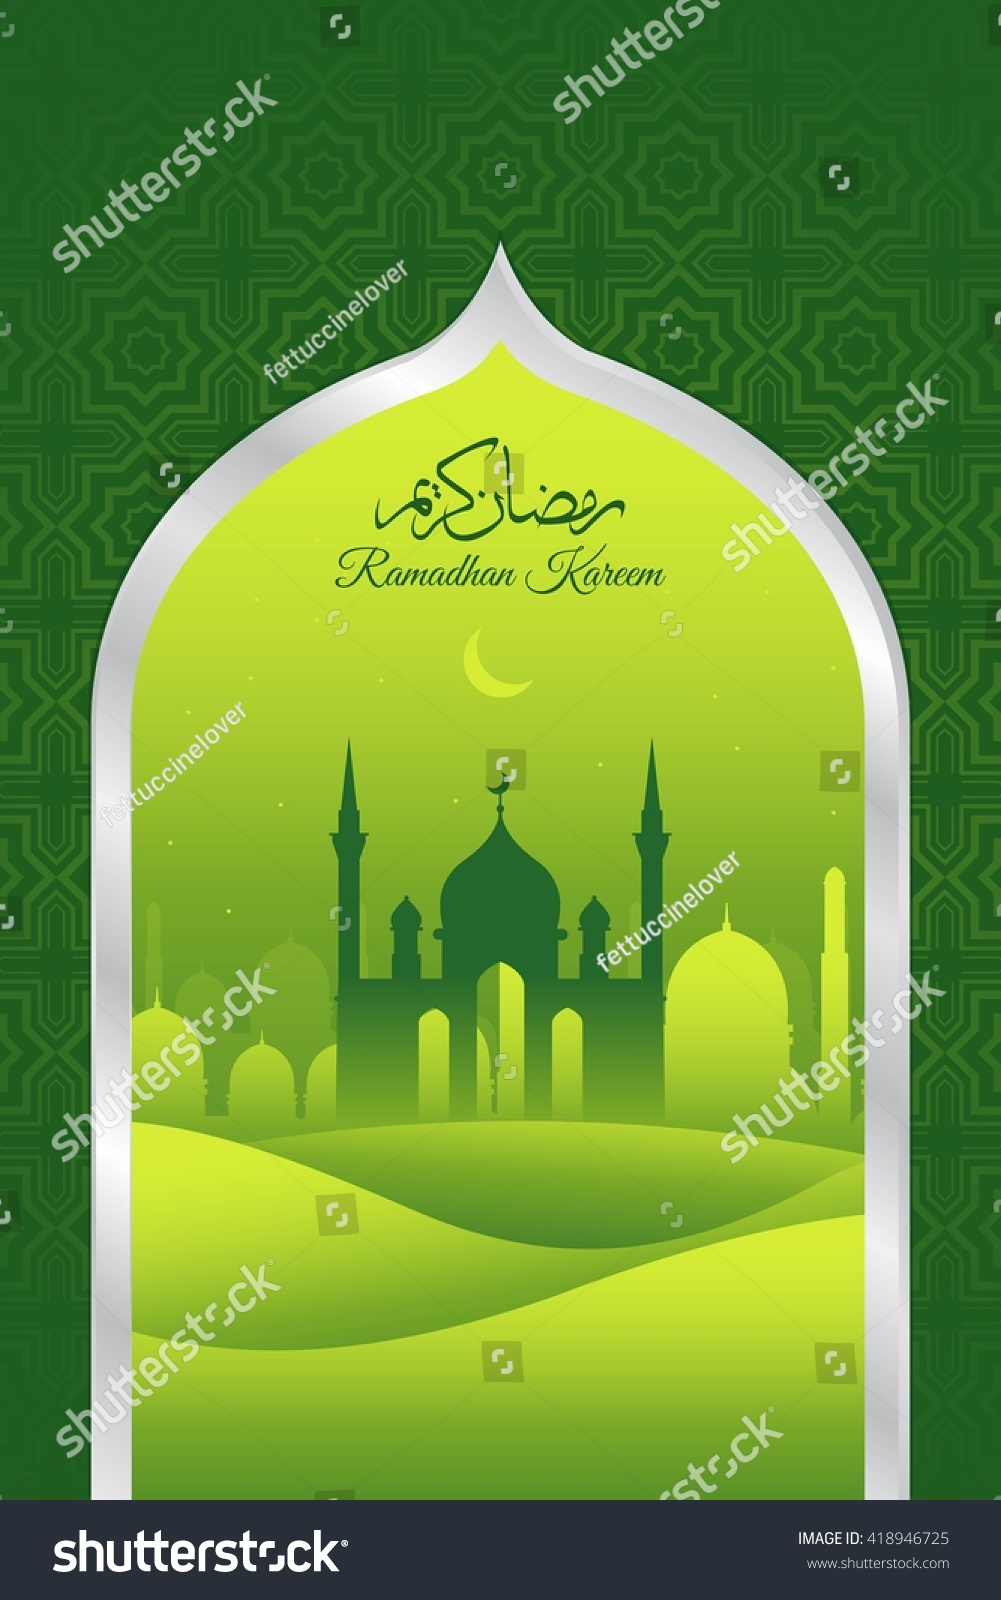 Creative Illustration Of Eid Milad Un Nabi Ez Canvas